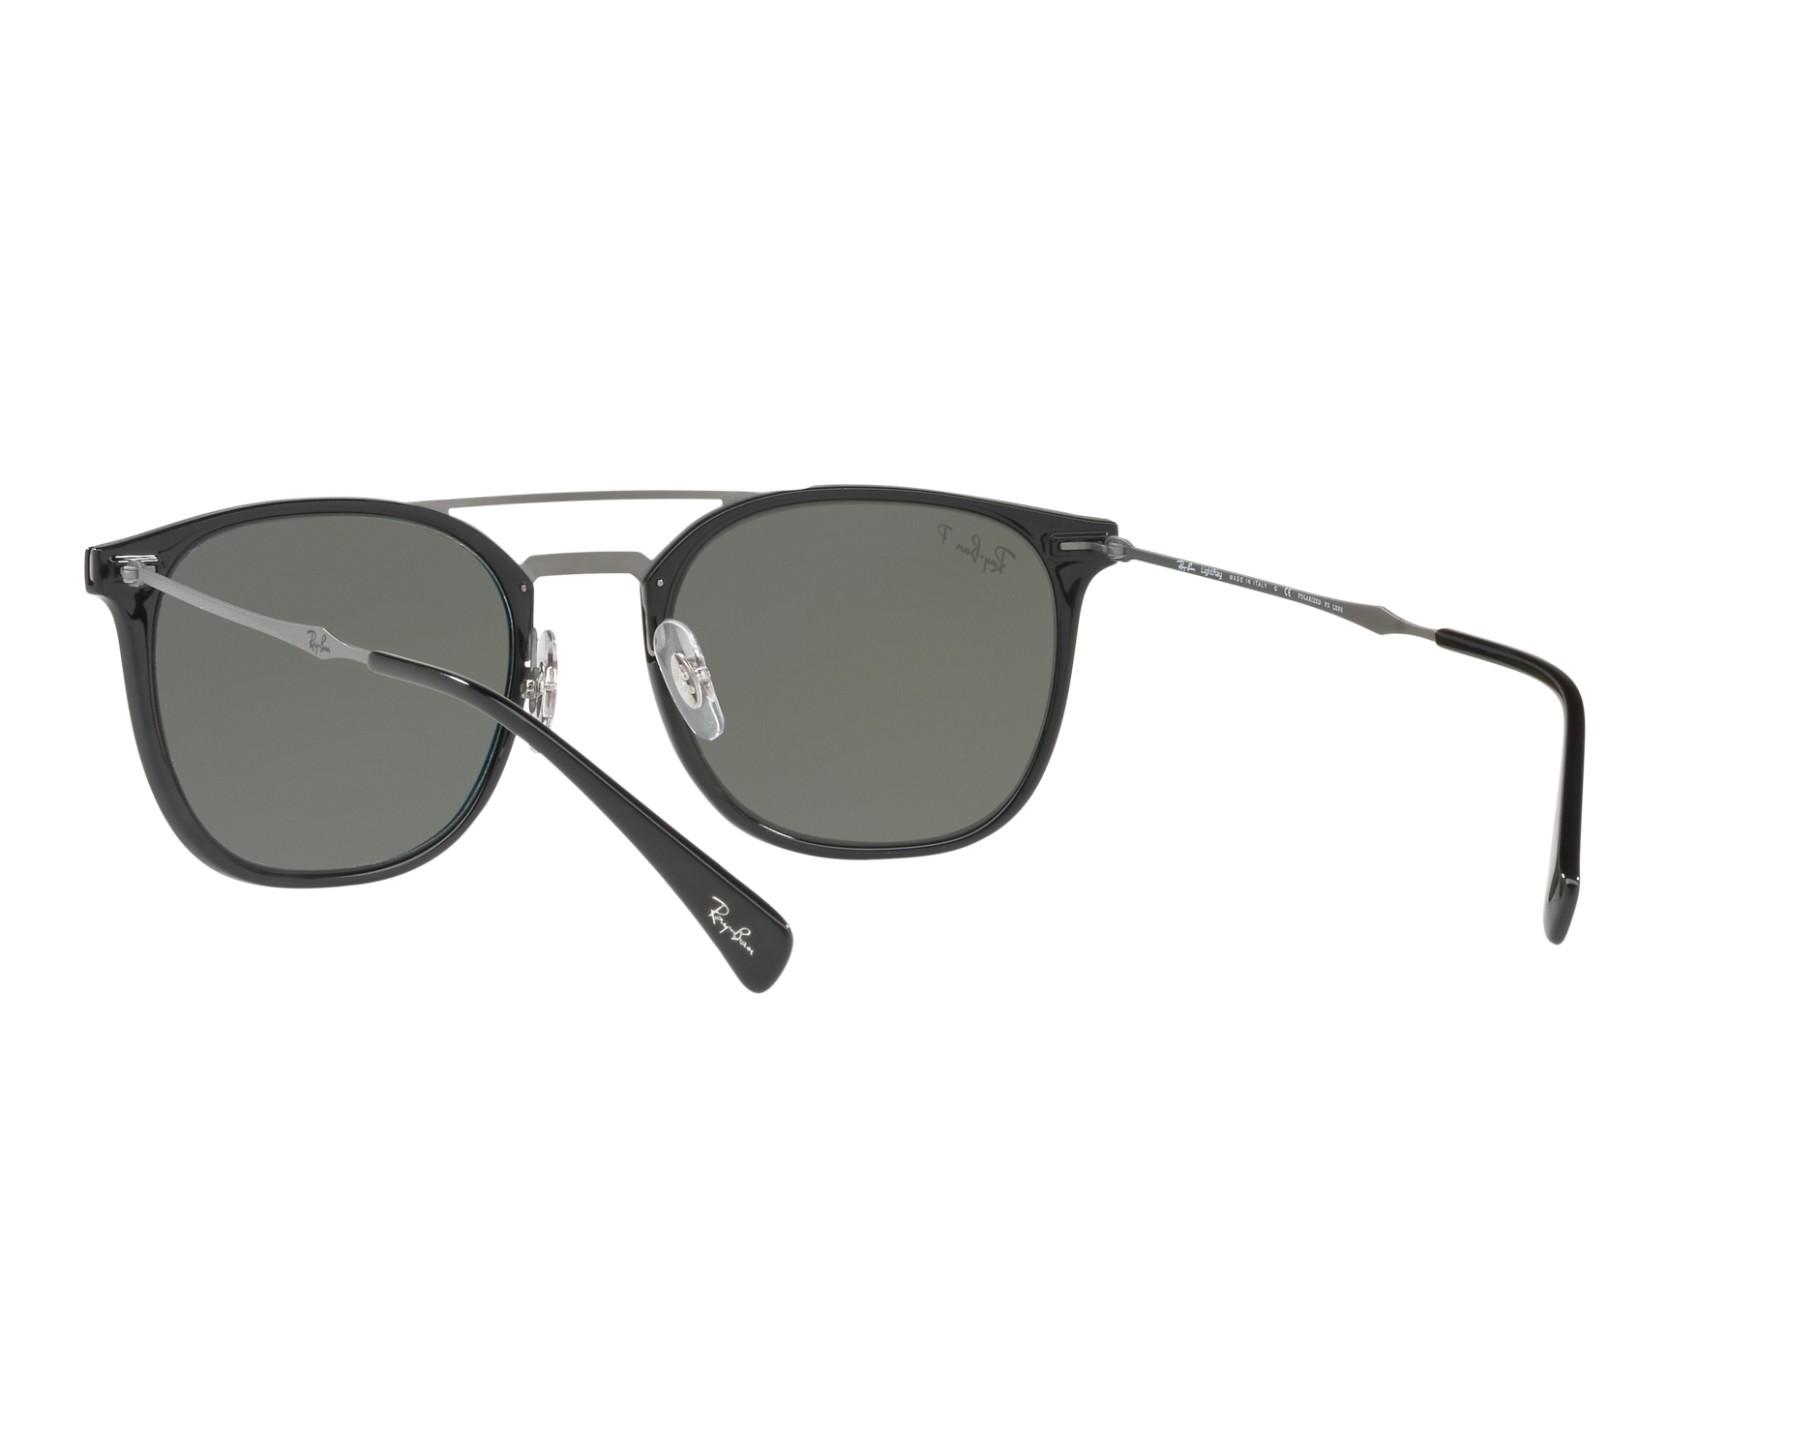 e7baa74fa3 Sunglasses Ray-Ban RB-4286 601 9A - Black Grey 360 degree view